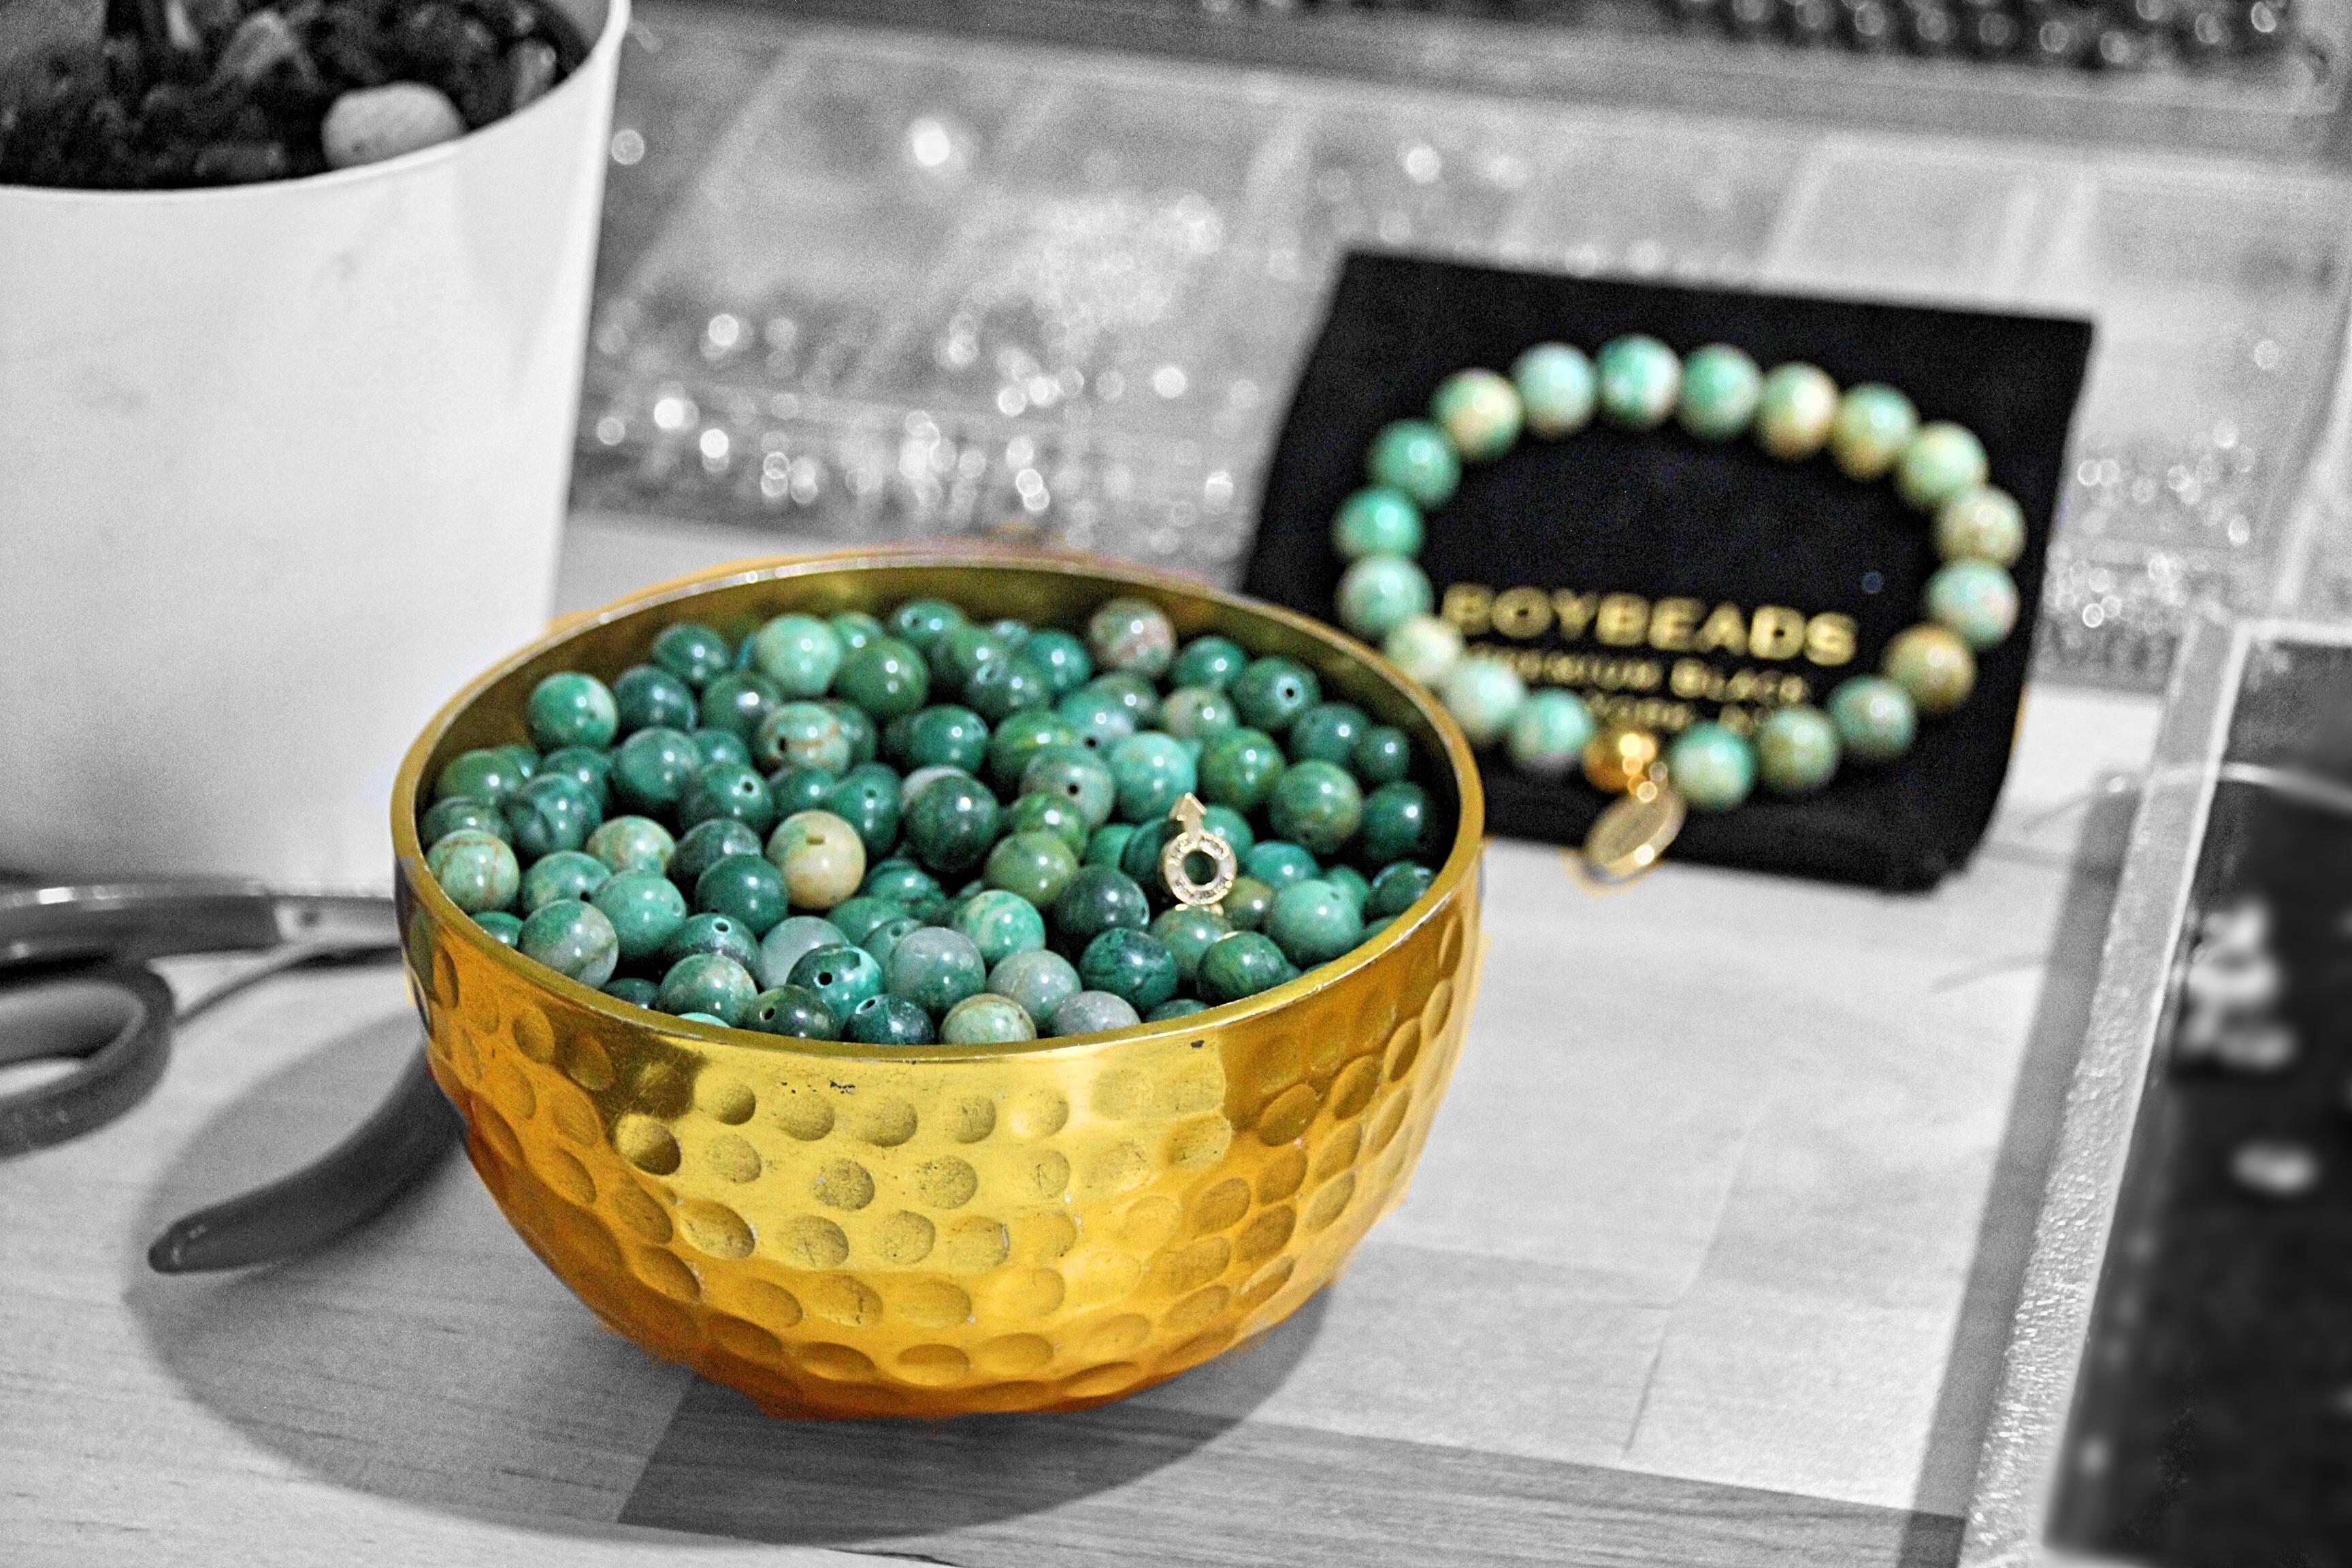 vernier-boybeads-african-green-jade-special-order-limited-edition-expensive-bead-bracelet-for-guys-men-boys-my-husband-boyfriend-jade-bracelet-2018-jewelry-studio-nyc.jpg